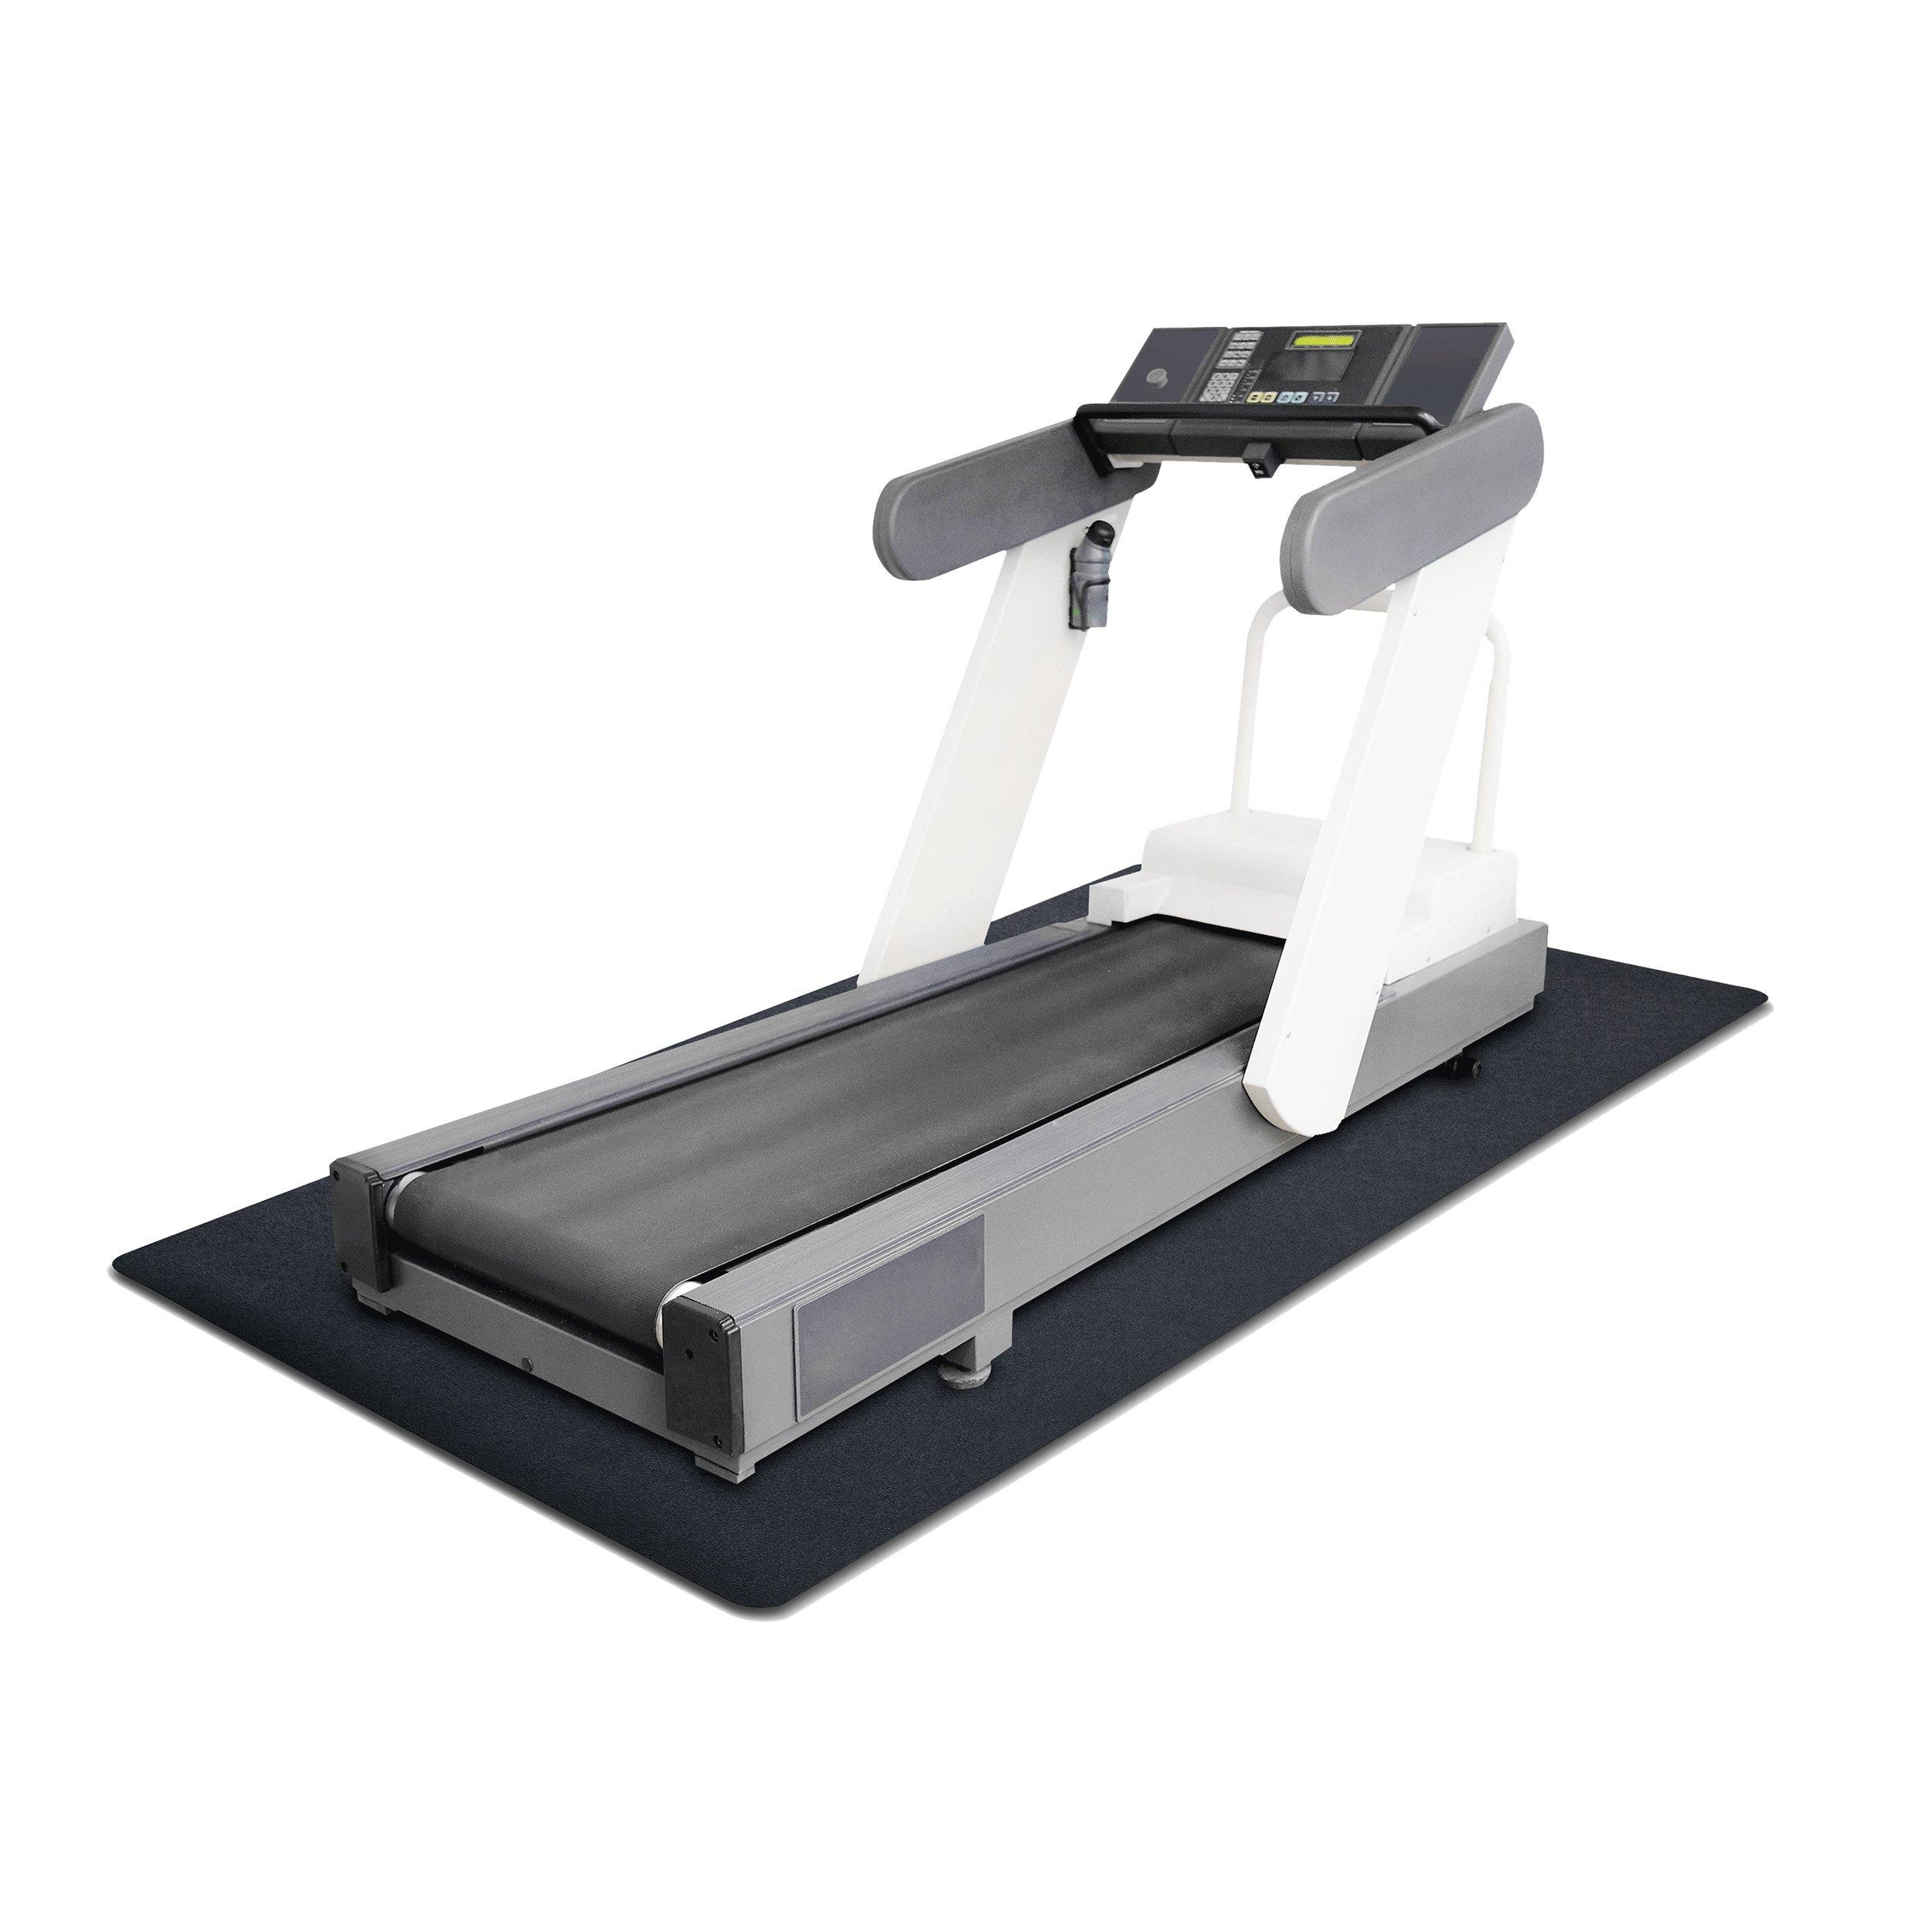 MotionTex 8M-110-36C-7 Fitness Equipment Mat, 36'' x 84'', Black